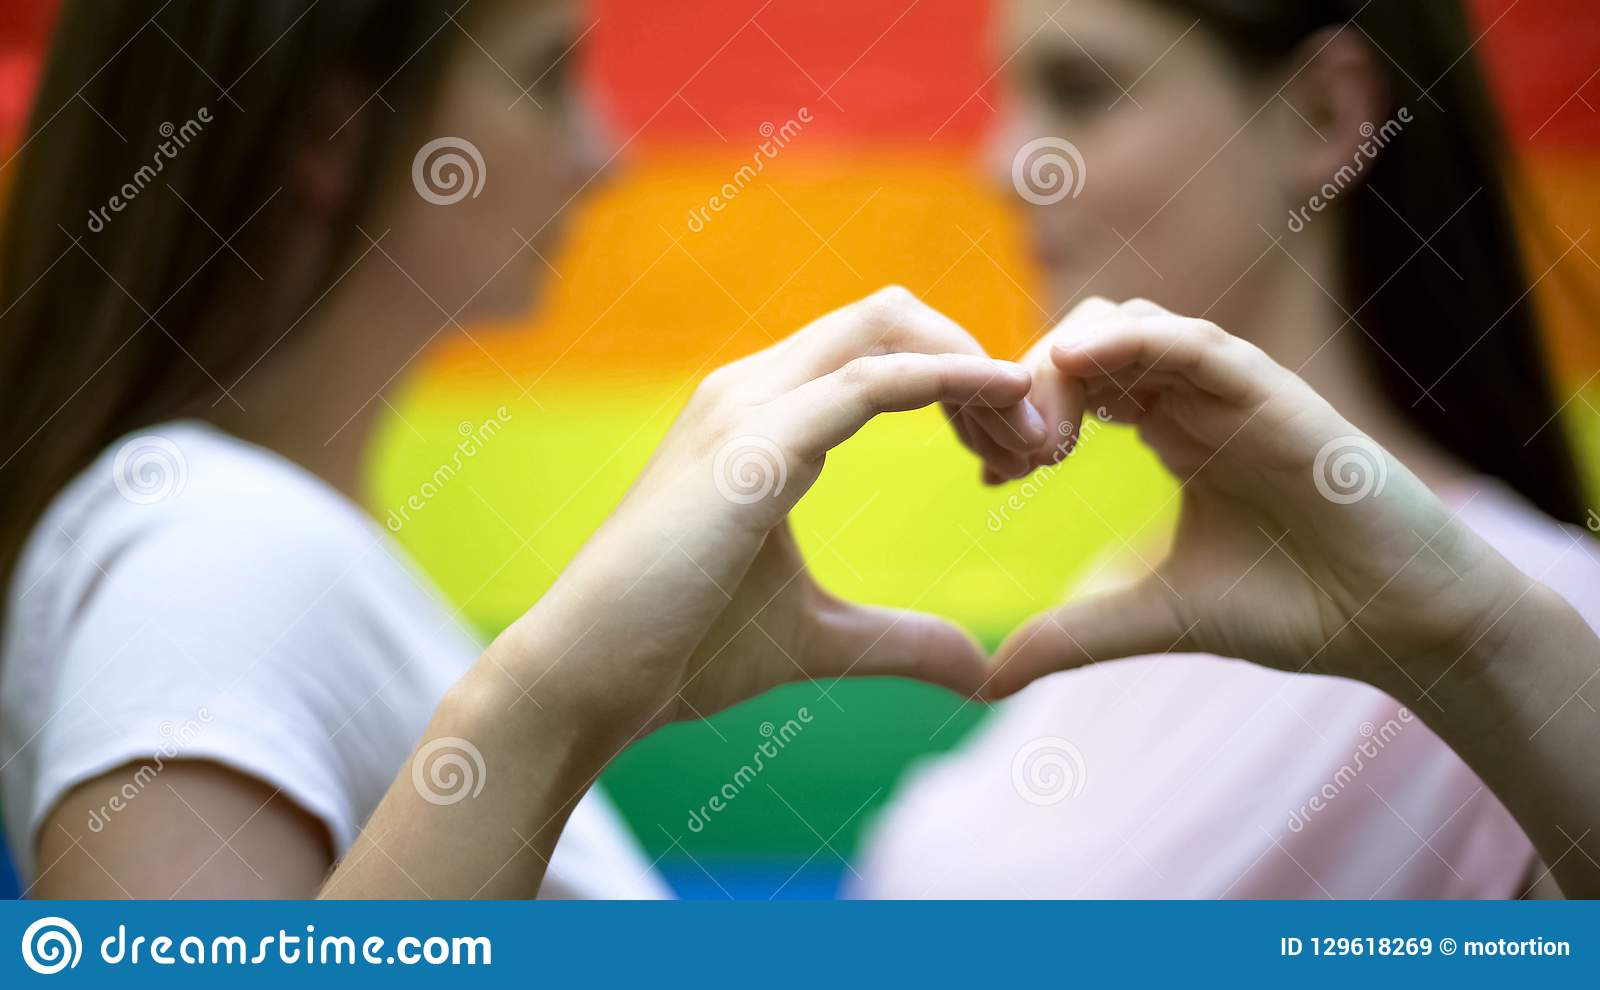 100 free dating site ireland